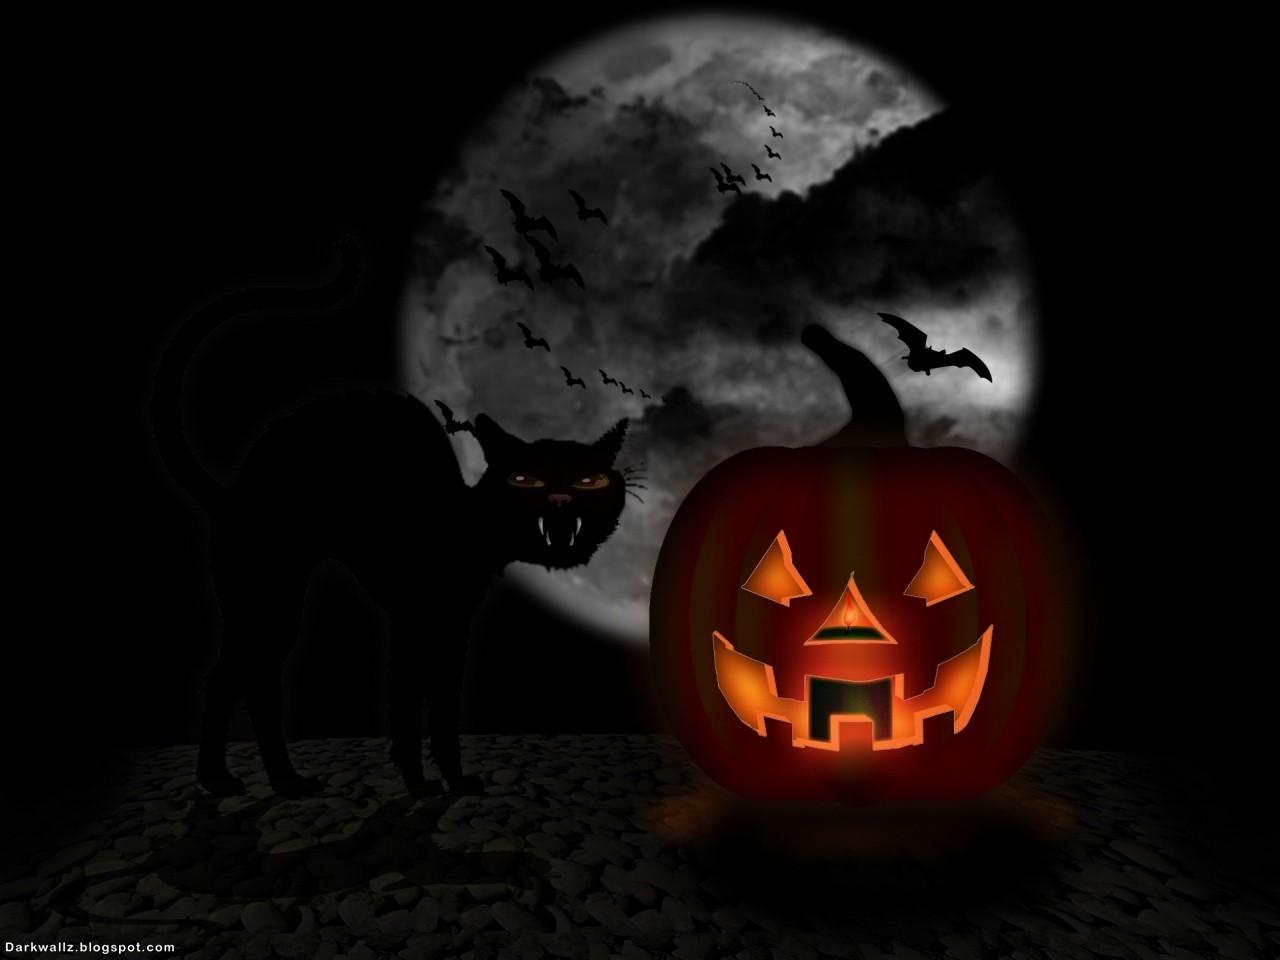 http://4.bp.blogspot.com/_-jo2ZCYhKaY/S4ajv9D4tLI/AAAAAAAAFzo/CAlgWzn450o/s1600/Halloween_Wallpapers_118+(darkwallz.blogspot.com).jpg